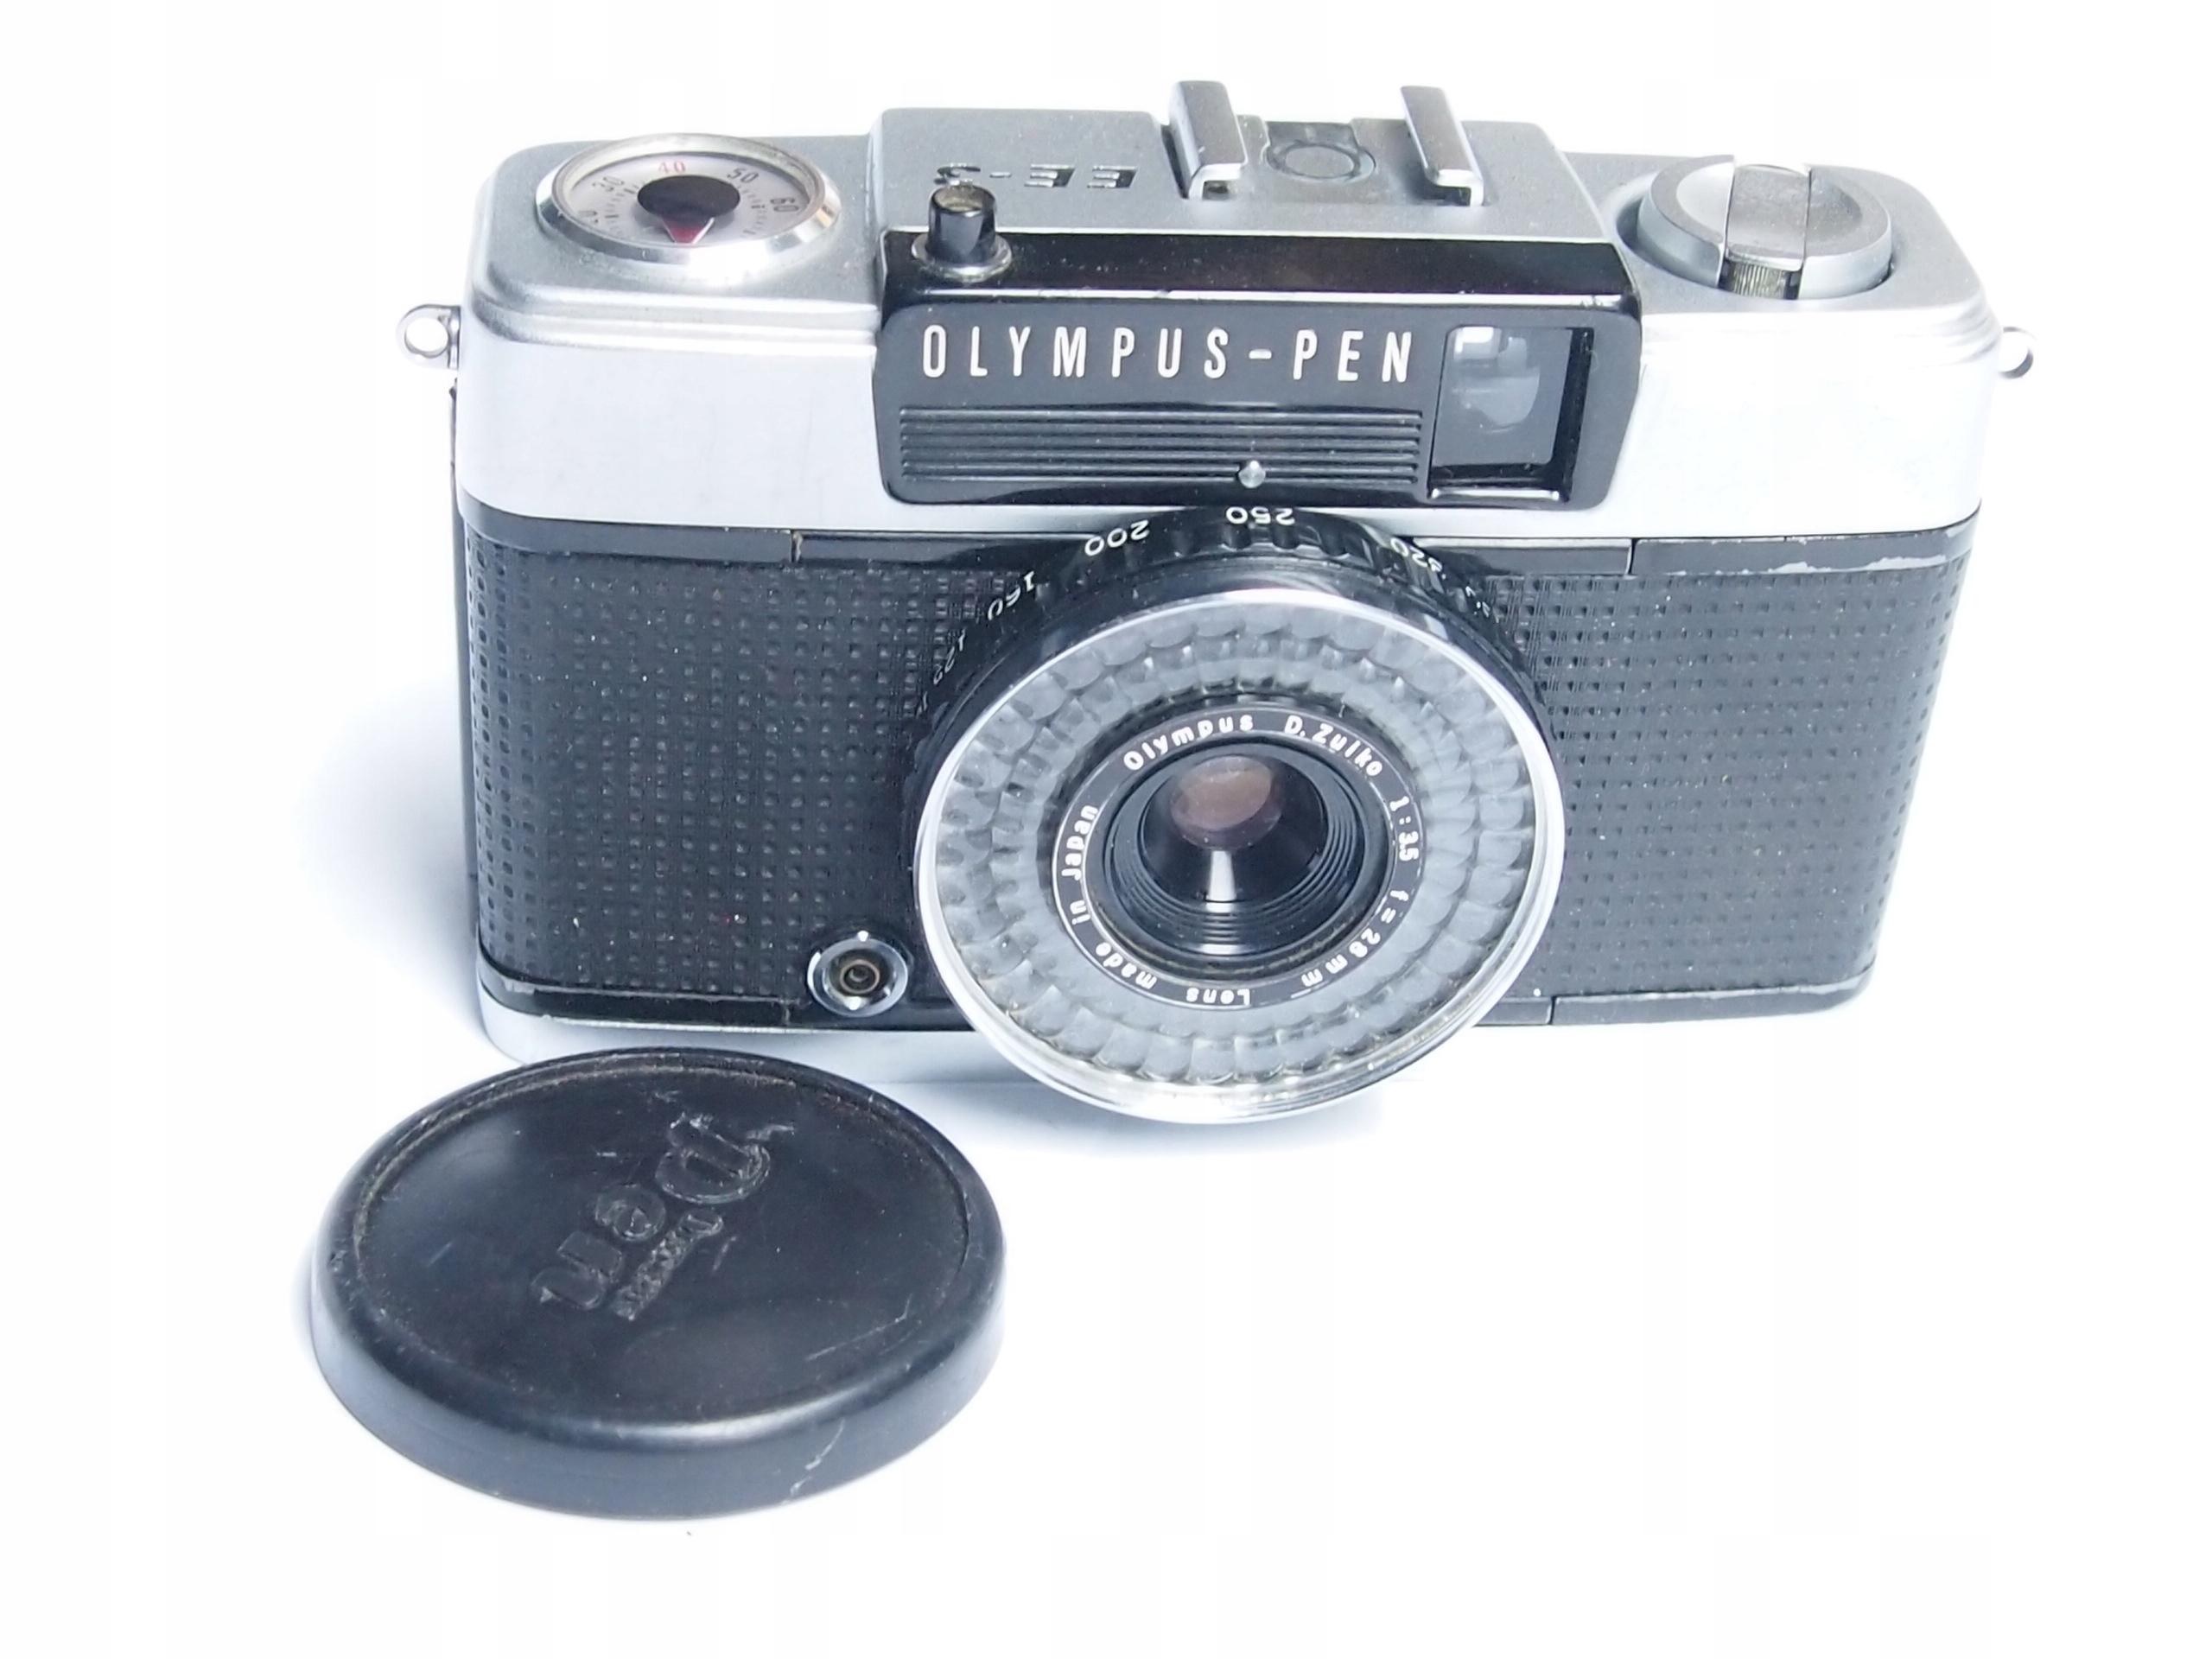 Aparat kolekcjonerski Olympus EE-3